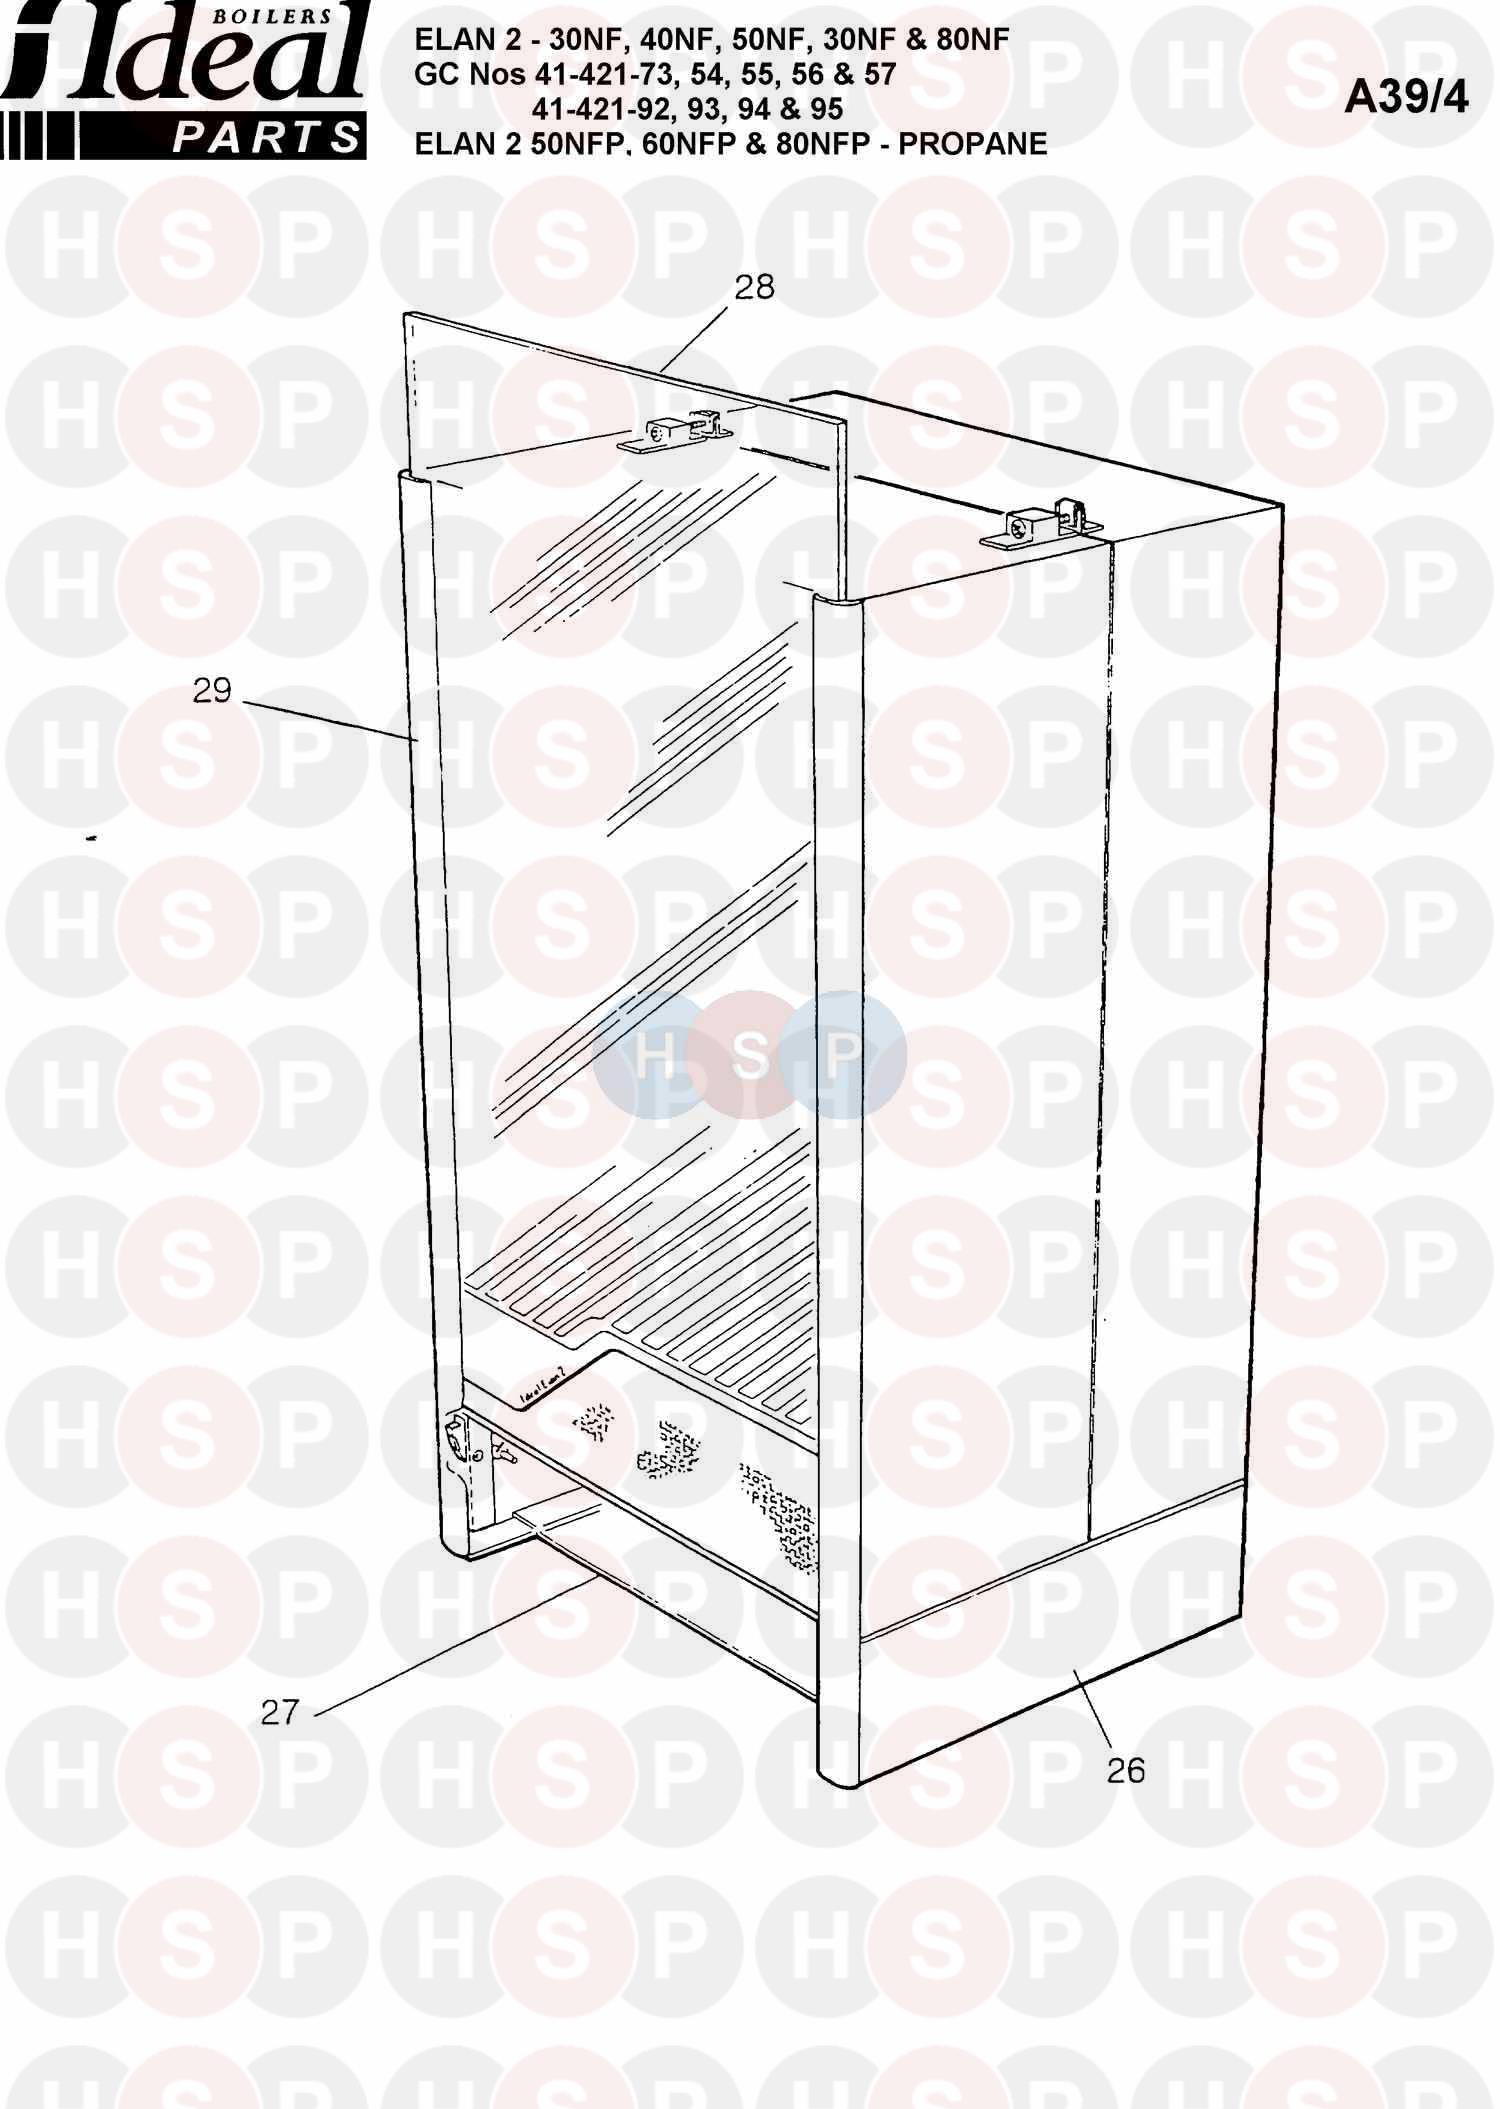 Ideal Elan 2 80nf Boiler Casing Diagram Heating Spare